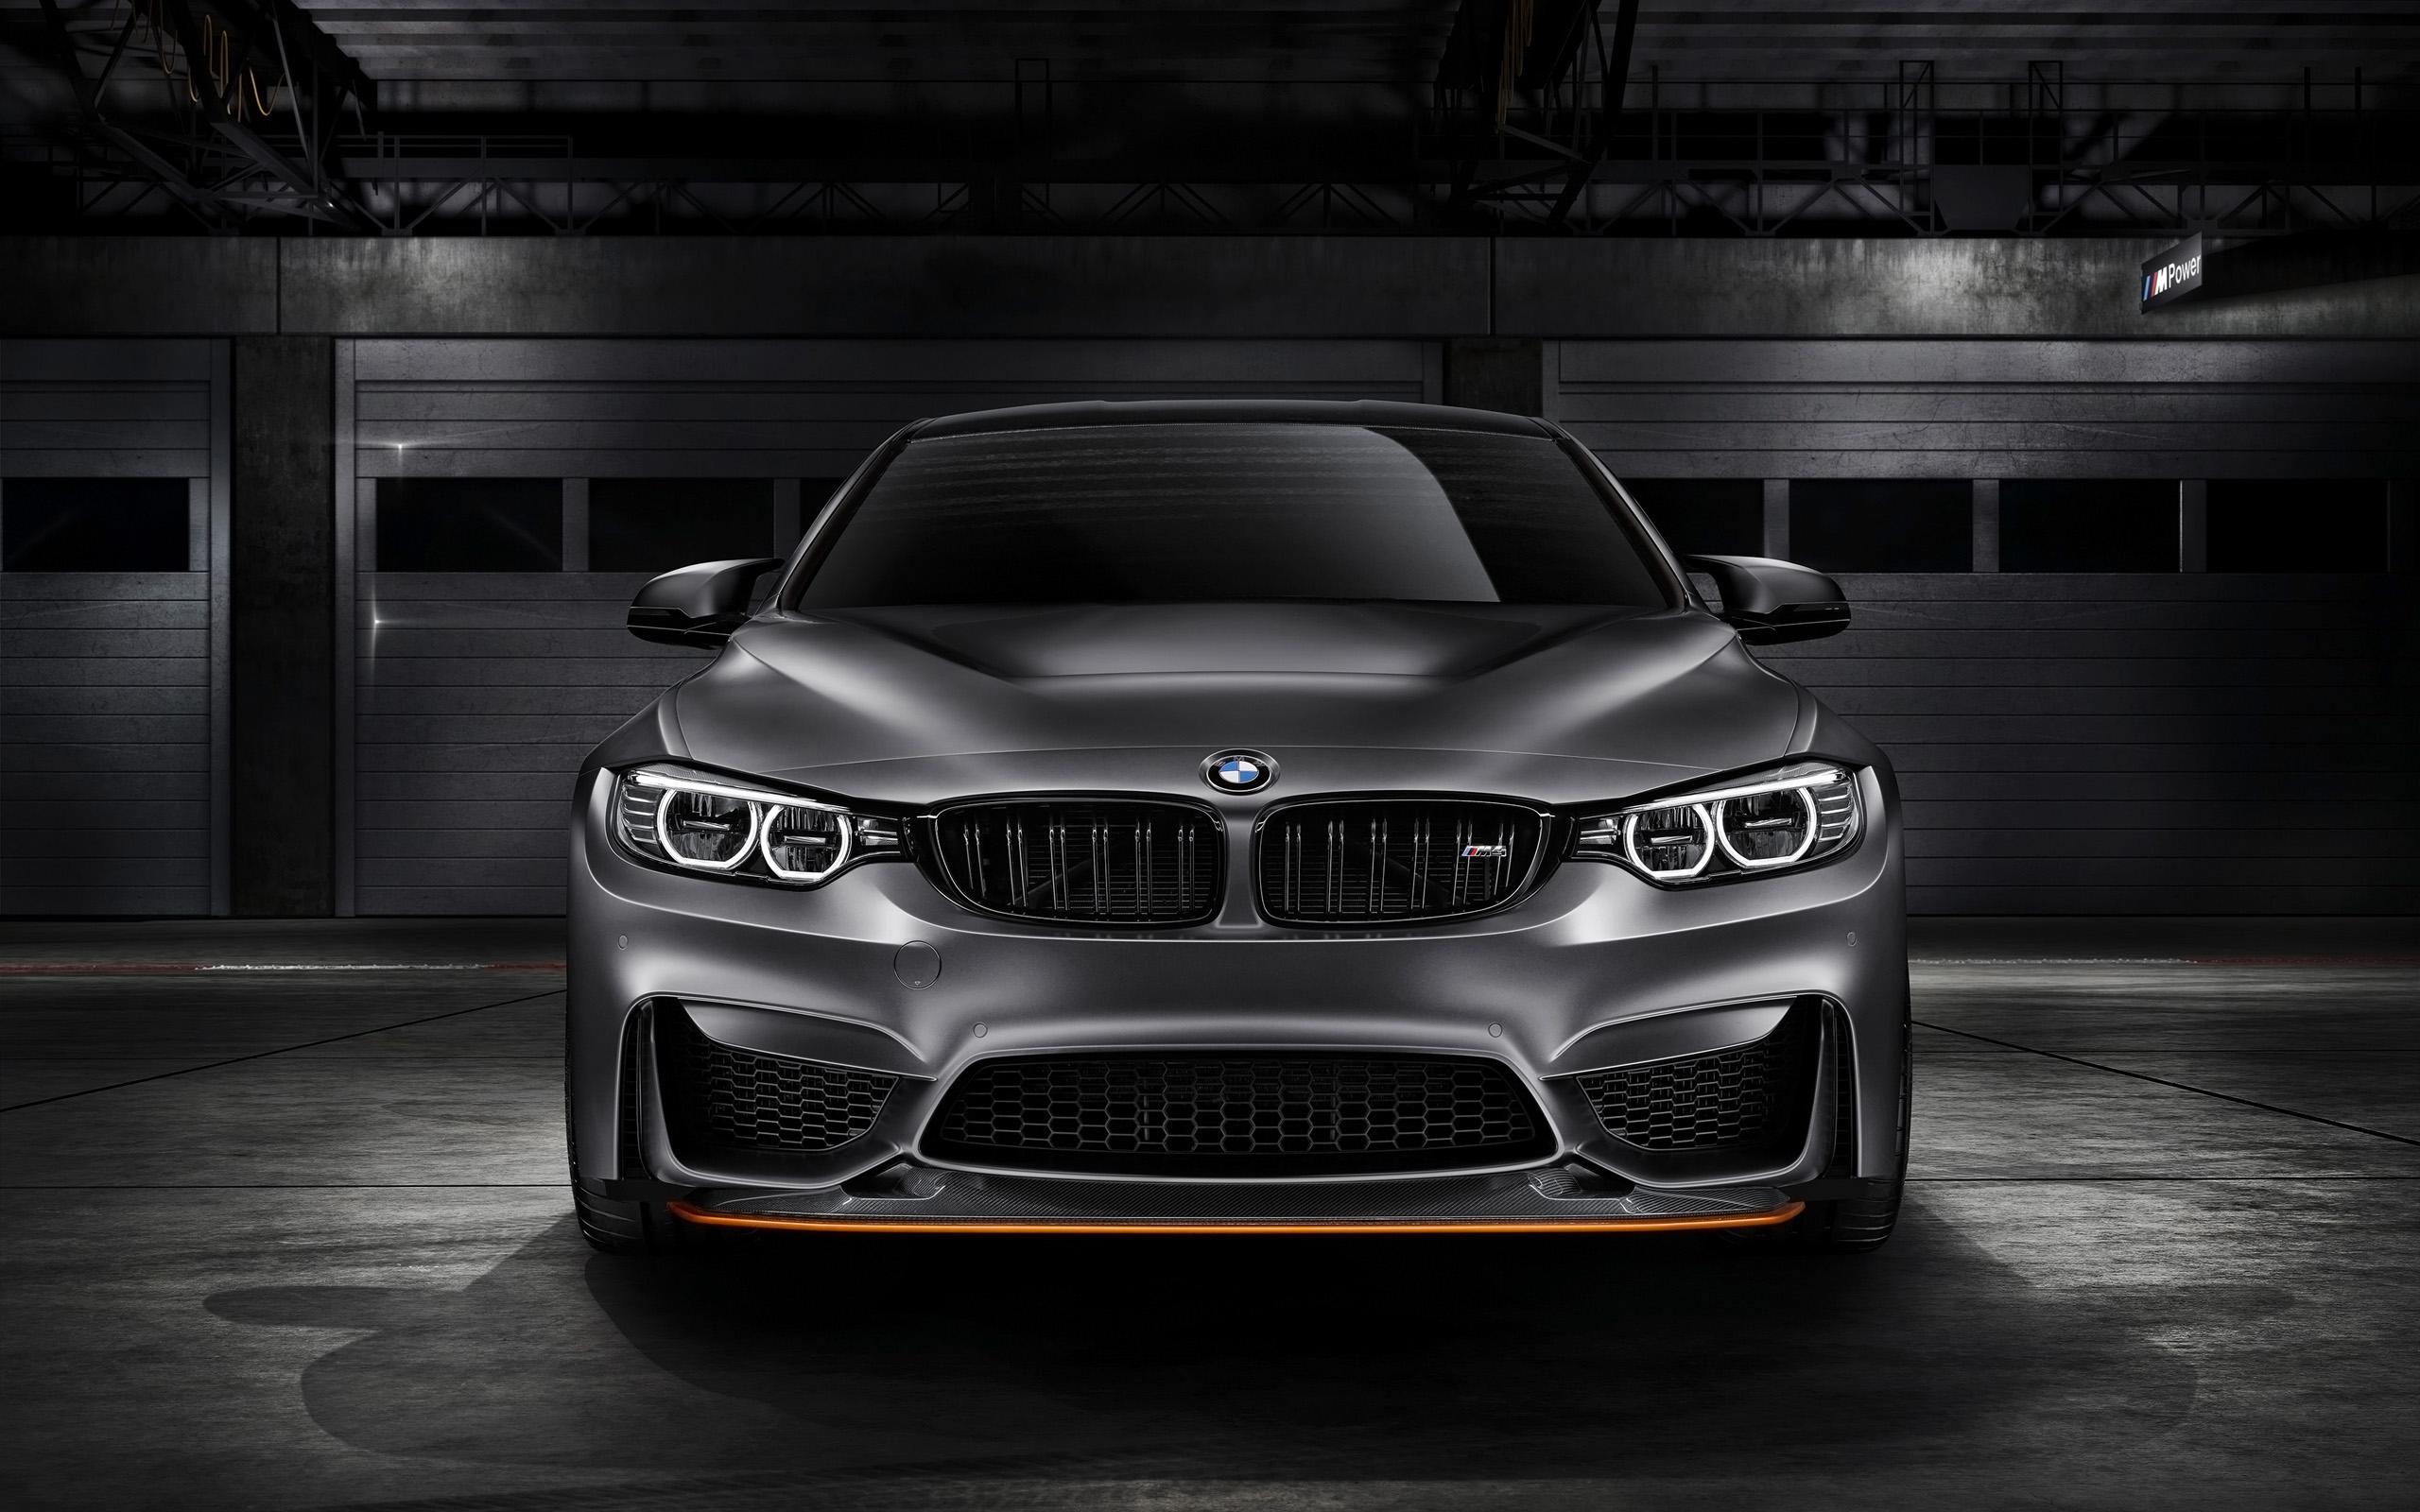 2015 Bmw Concept M4 Gts 2 Wallpaper Hd Car Wallpapers Id 5598